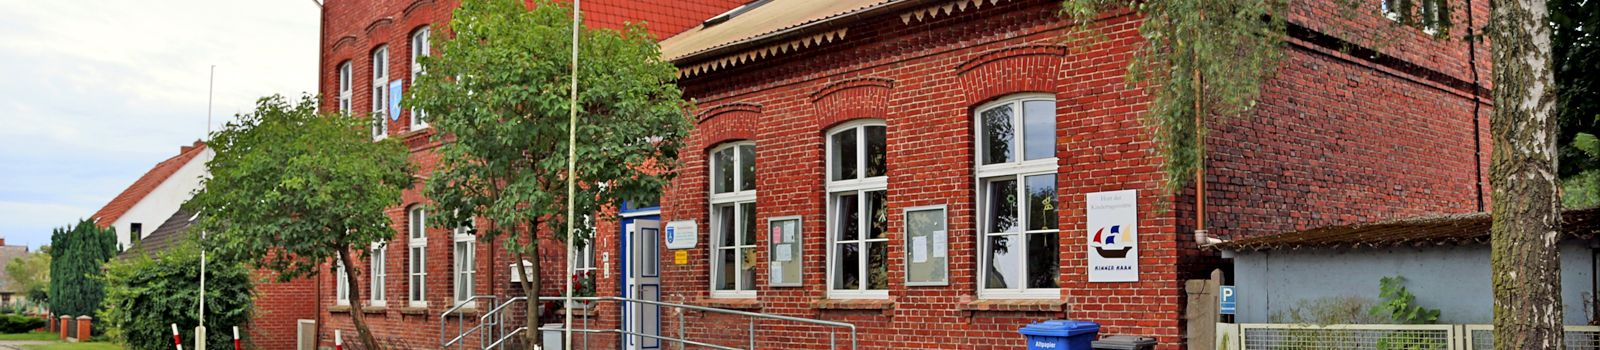 Gemeindezentrum Kröslin